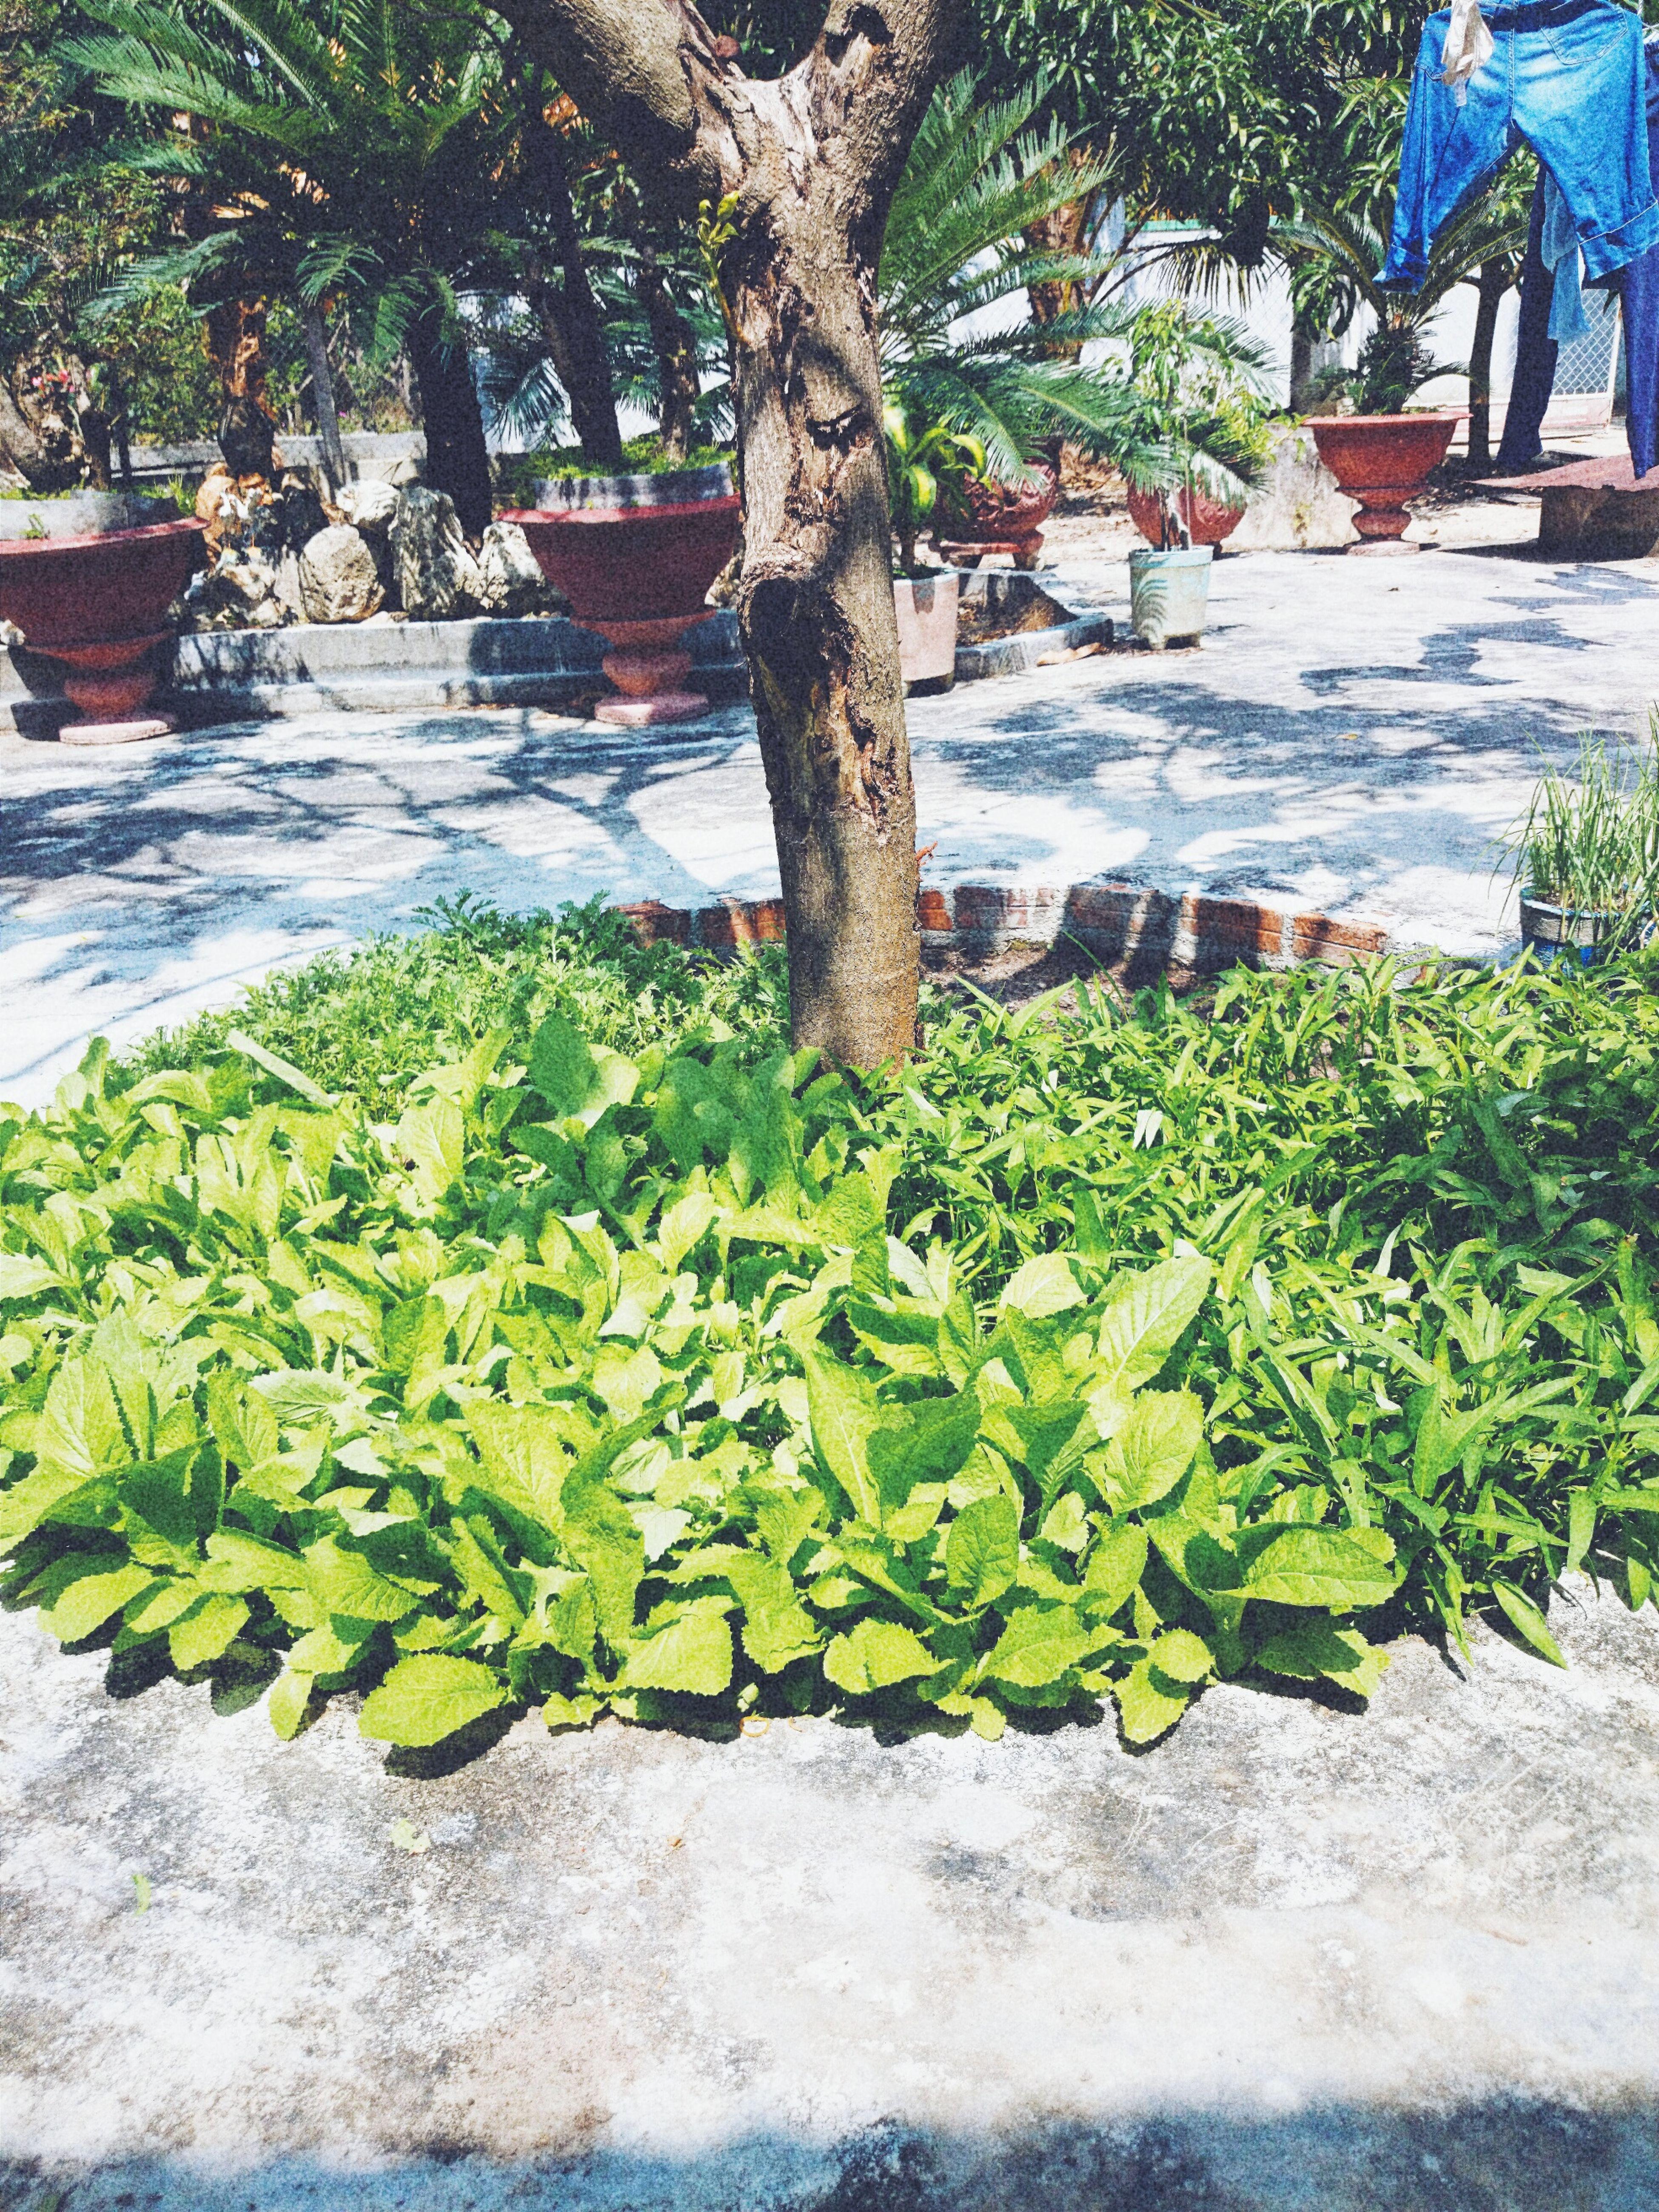 Garden vegestables